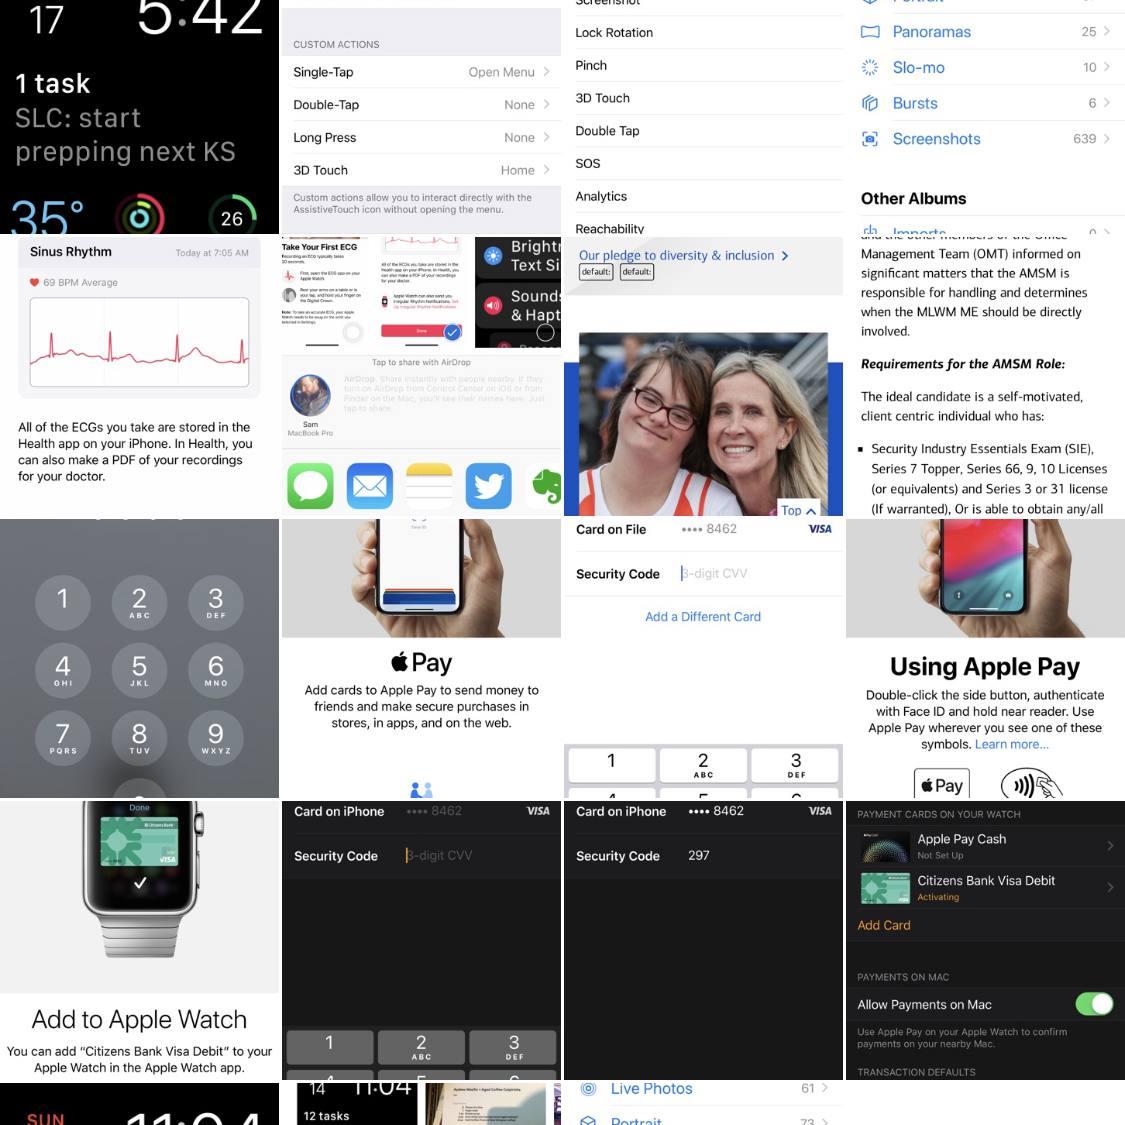 A screenshot of the Screenshots album in the Photos app